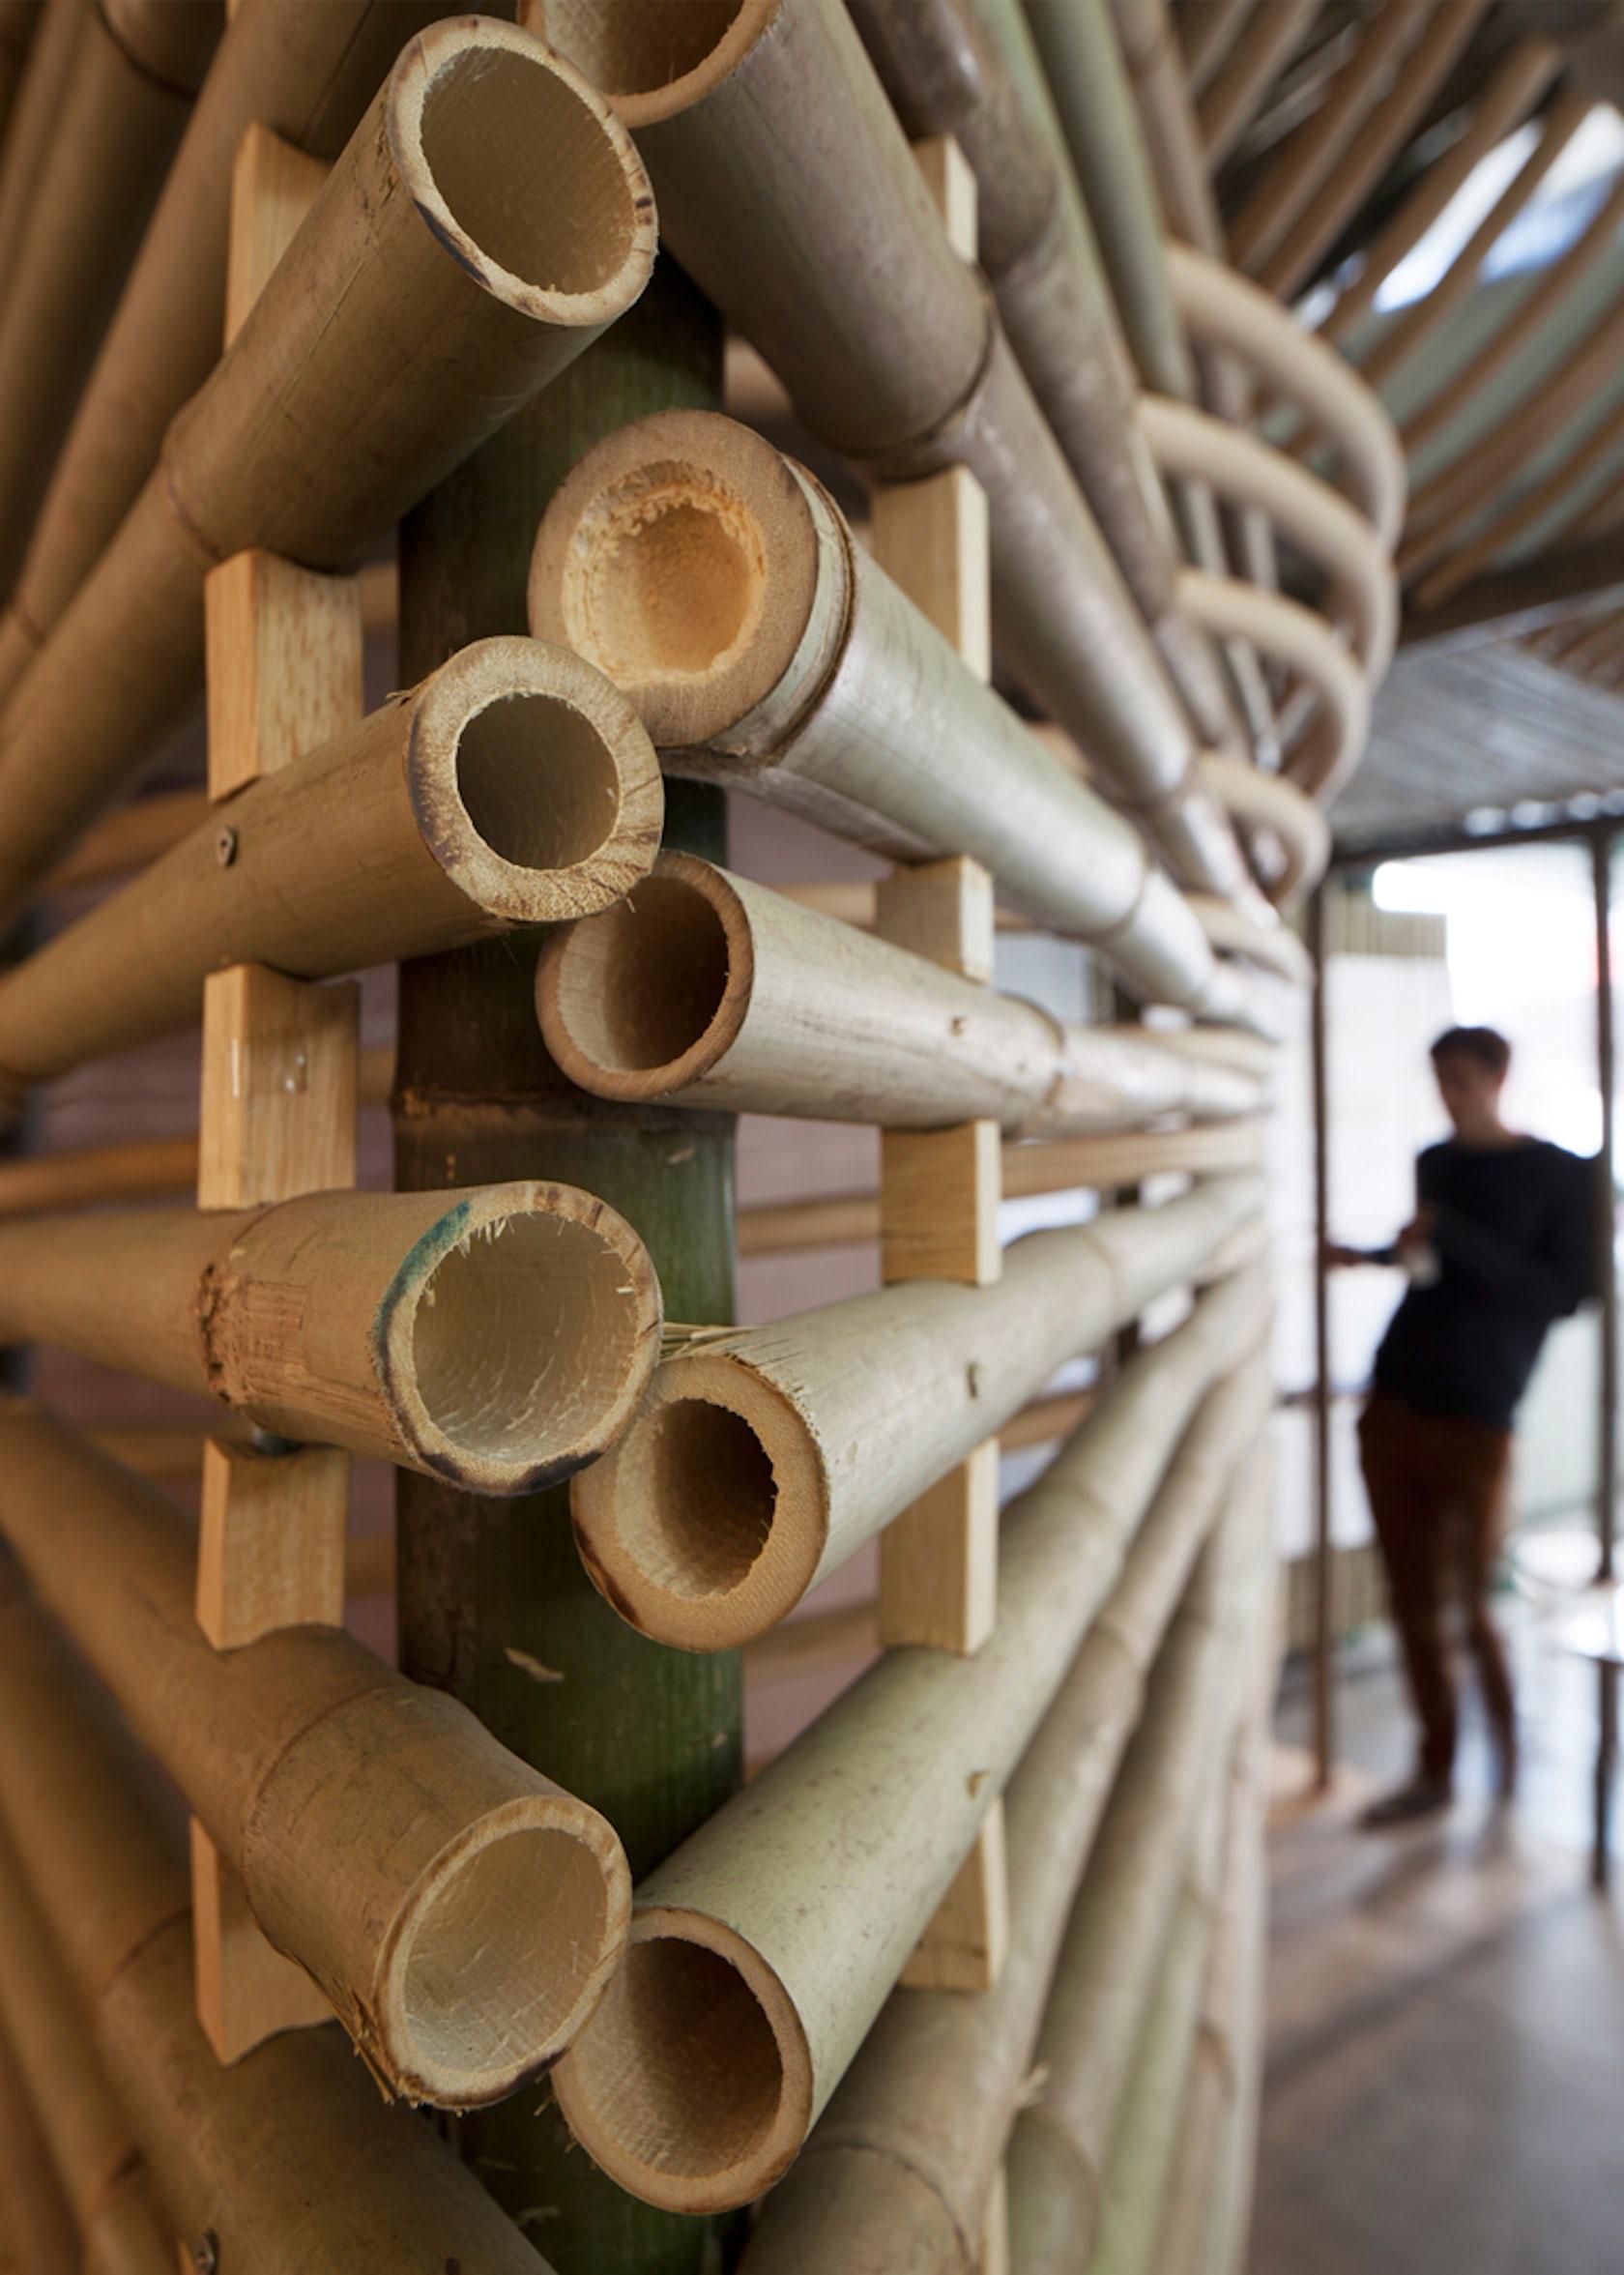 Bamboo micro housing architizer for Canne di bamboo da arredo